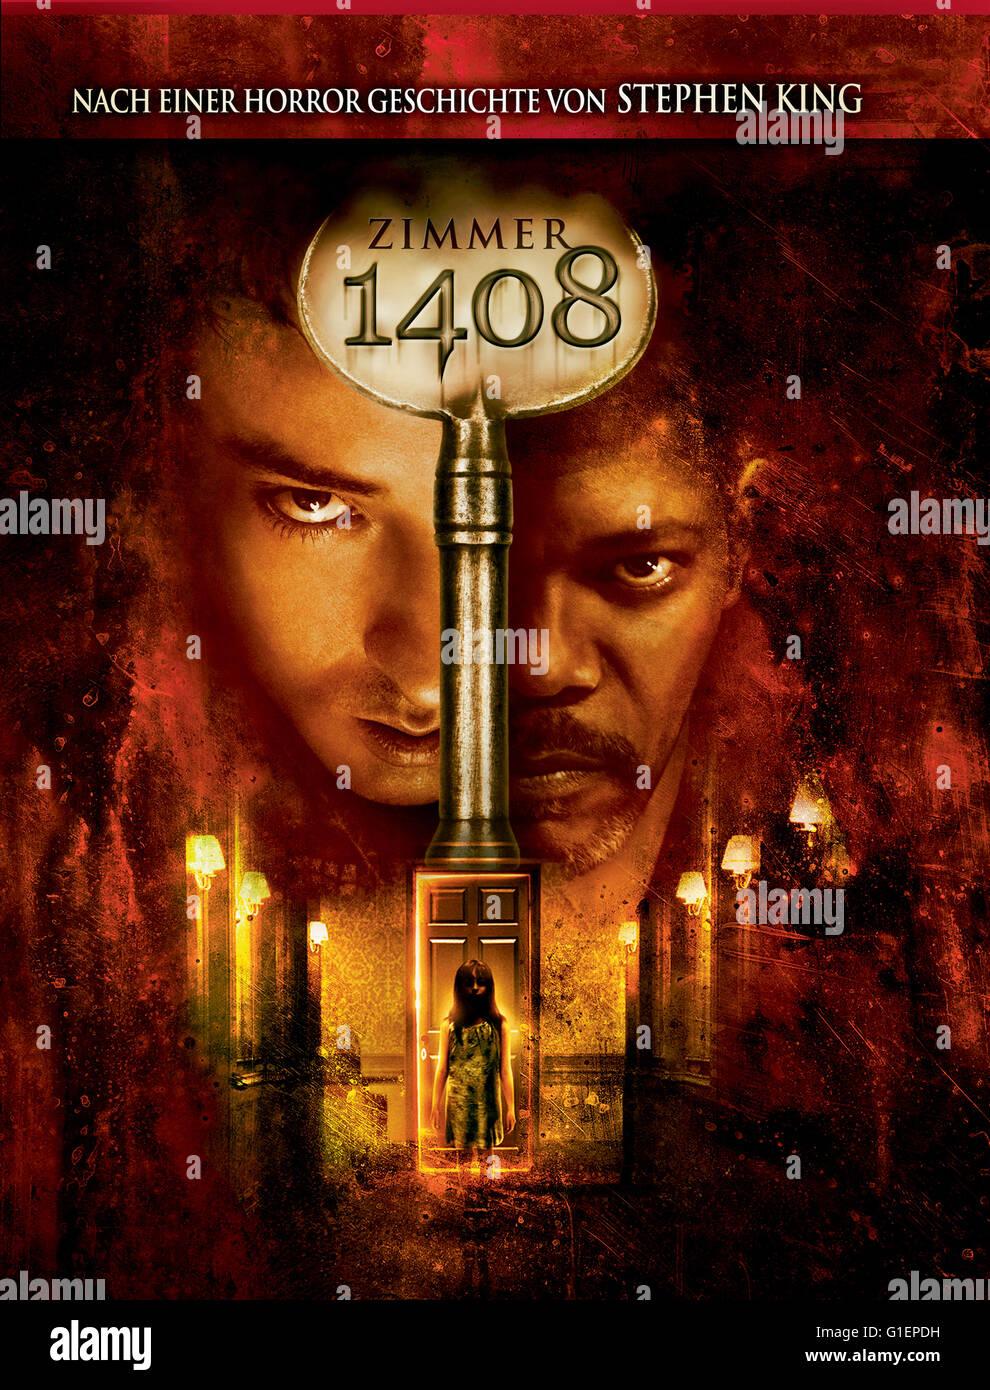 1408 Film Stock Photos & 1408 Film Stock Images - Alamy Chambre Film on